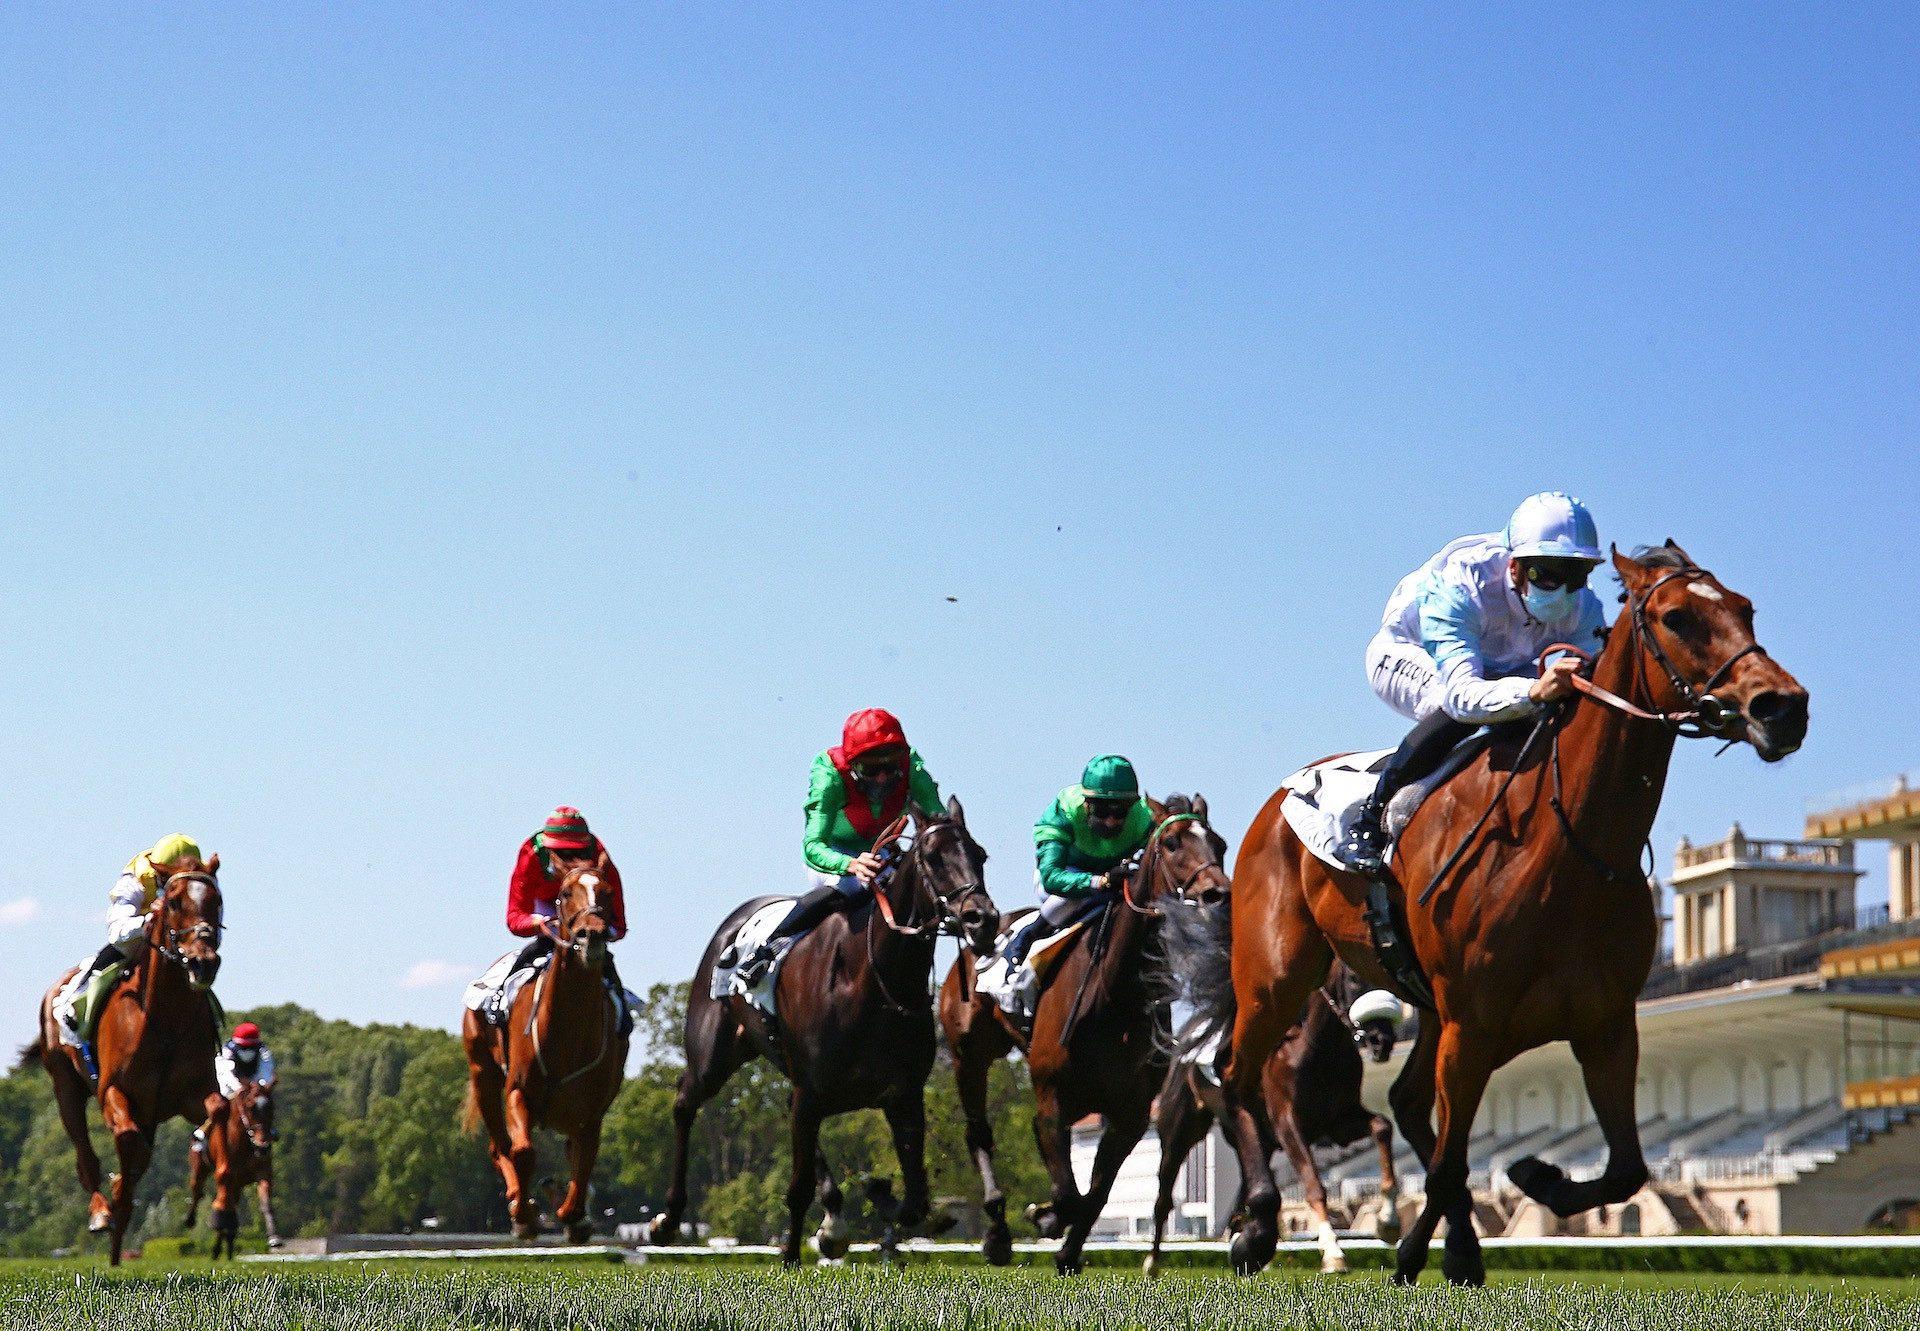 Magic Attitude (Galileo) Wins The Gr.3 Prix Vanteaux at Longchamp